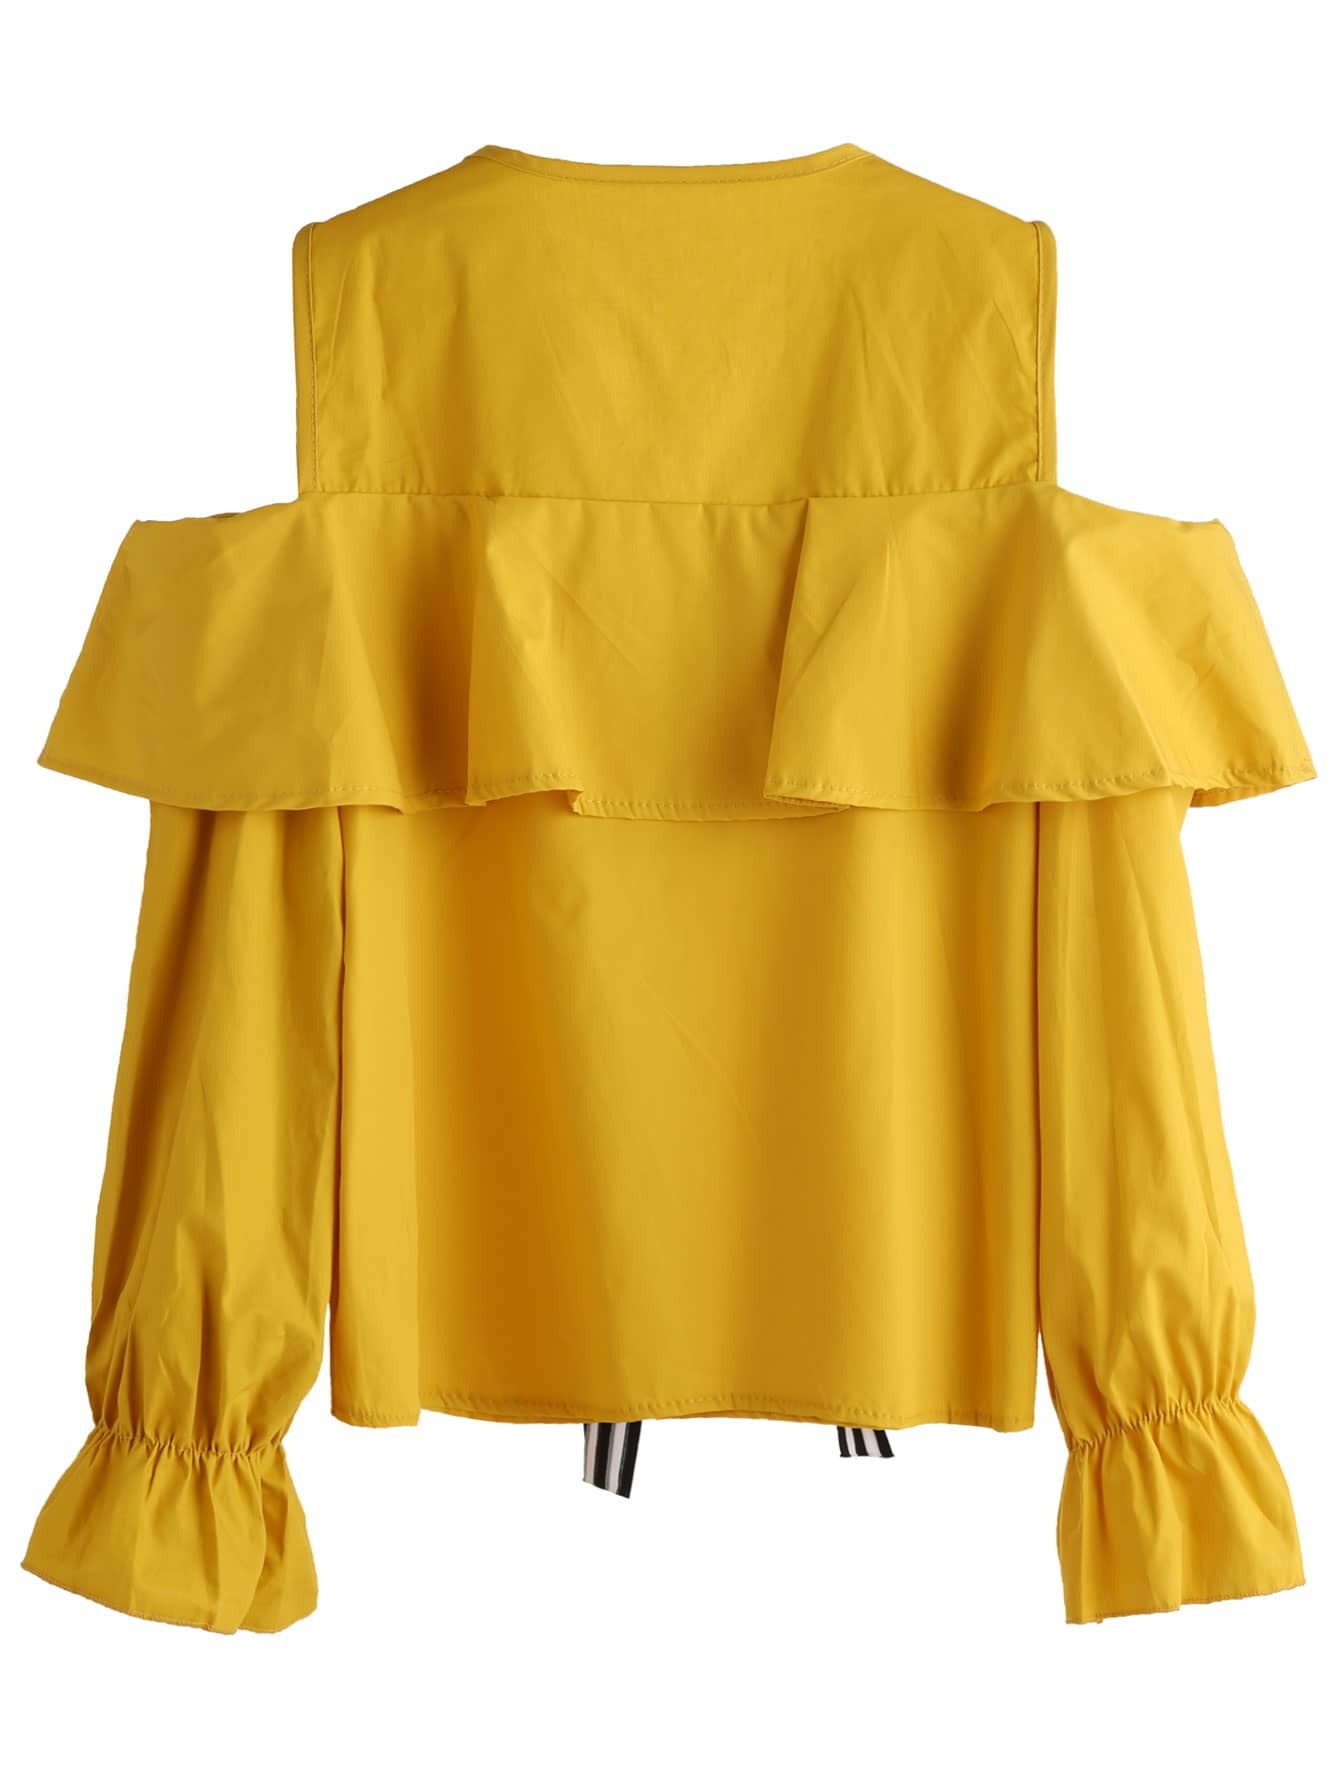 blouse160909022_2